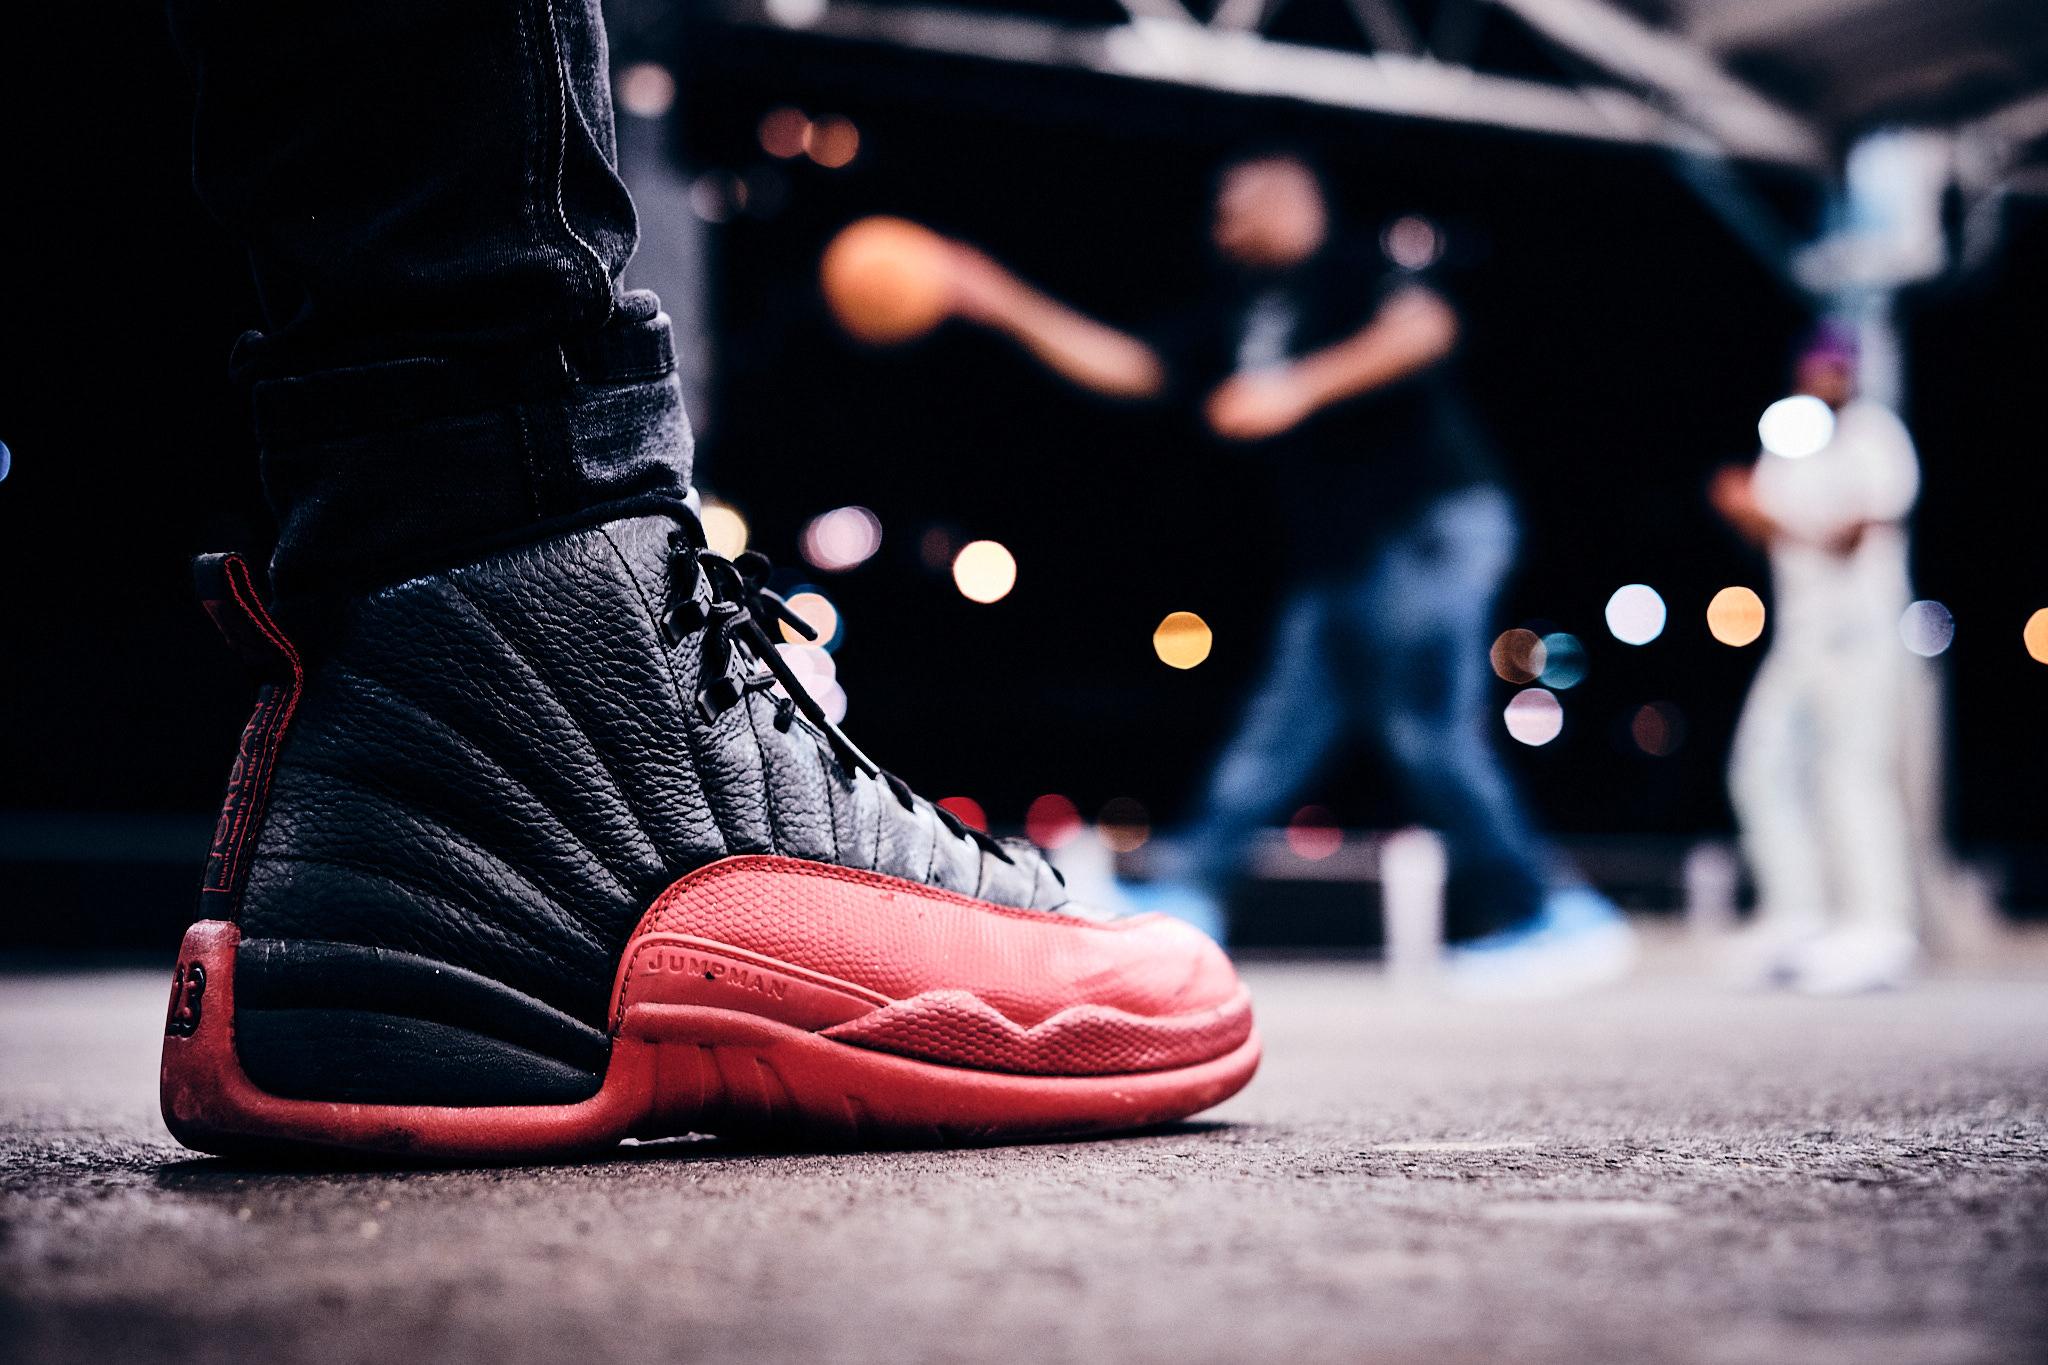 Street basket NYC